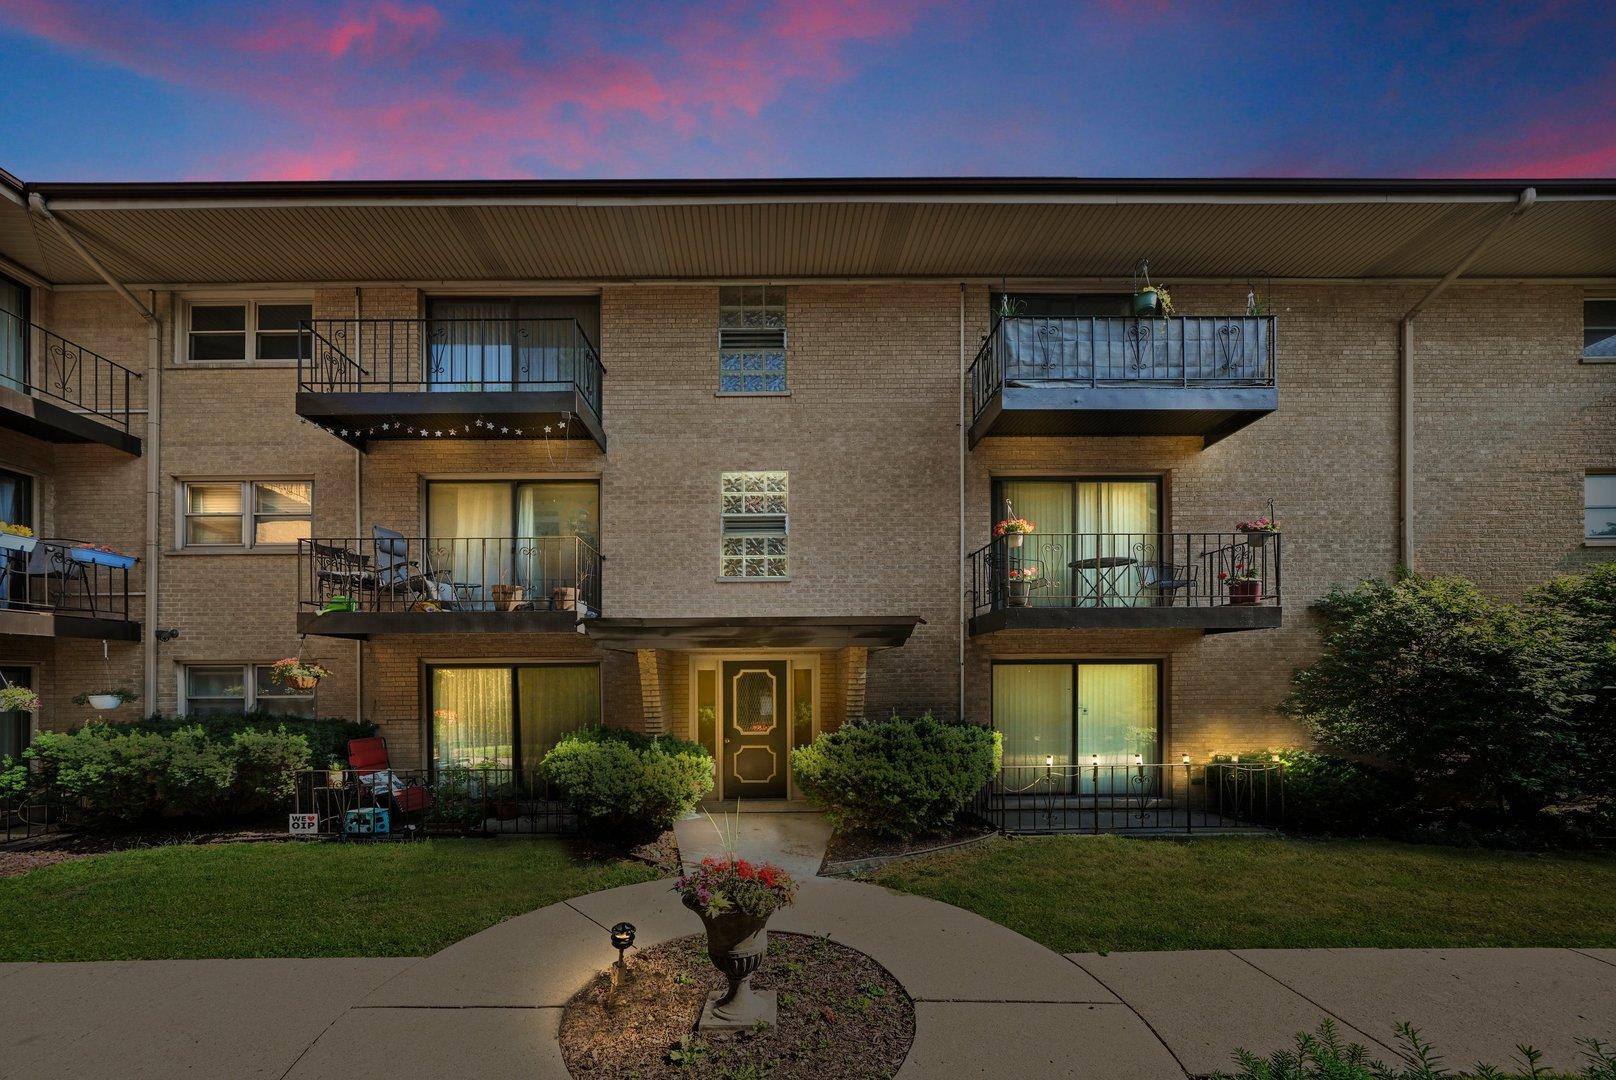 4208 Keystone Avenue, Chicago, Illinois 60641, 1 Bedroom Bedrooms, ,1 BathroomBathrooms,Residential,For Sale,Keystone,MRD11122606